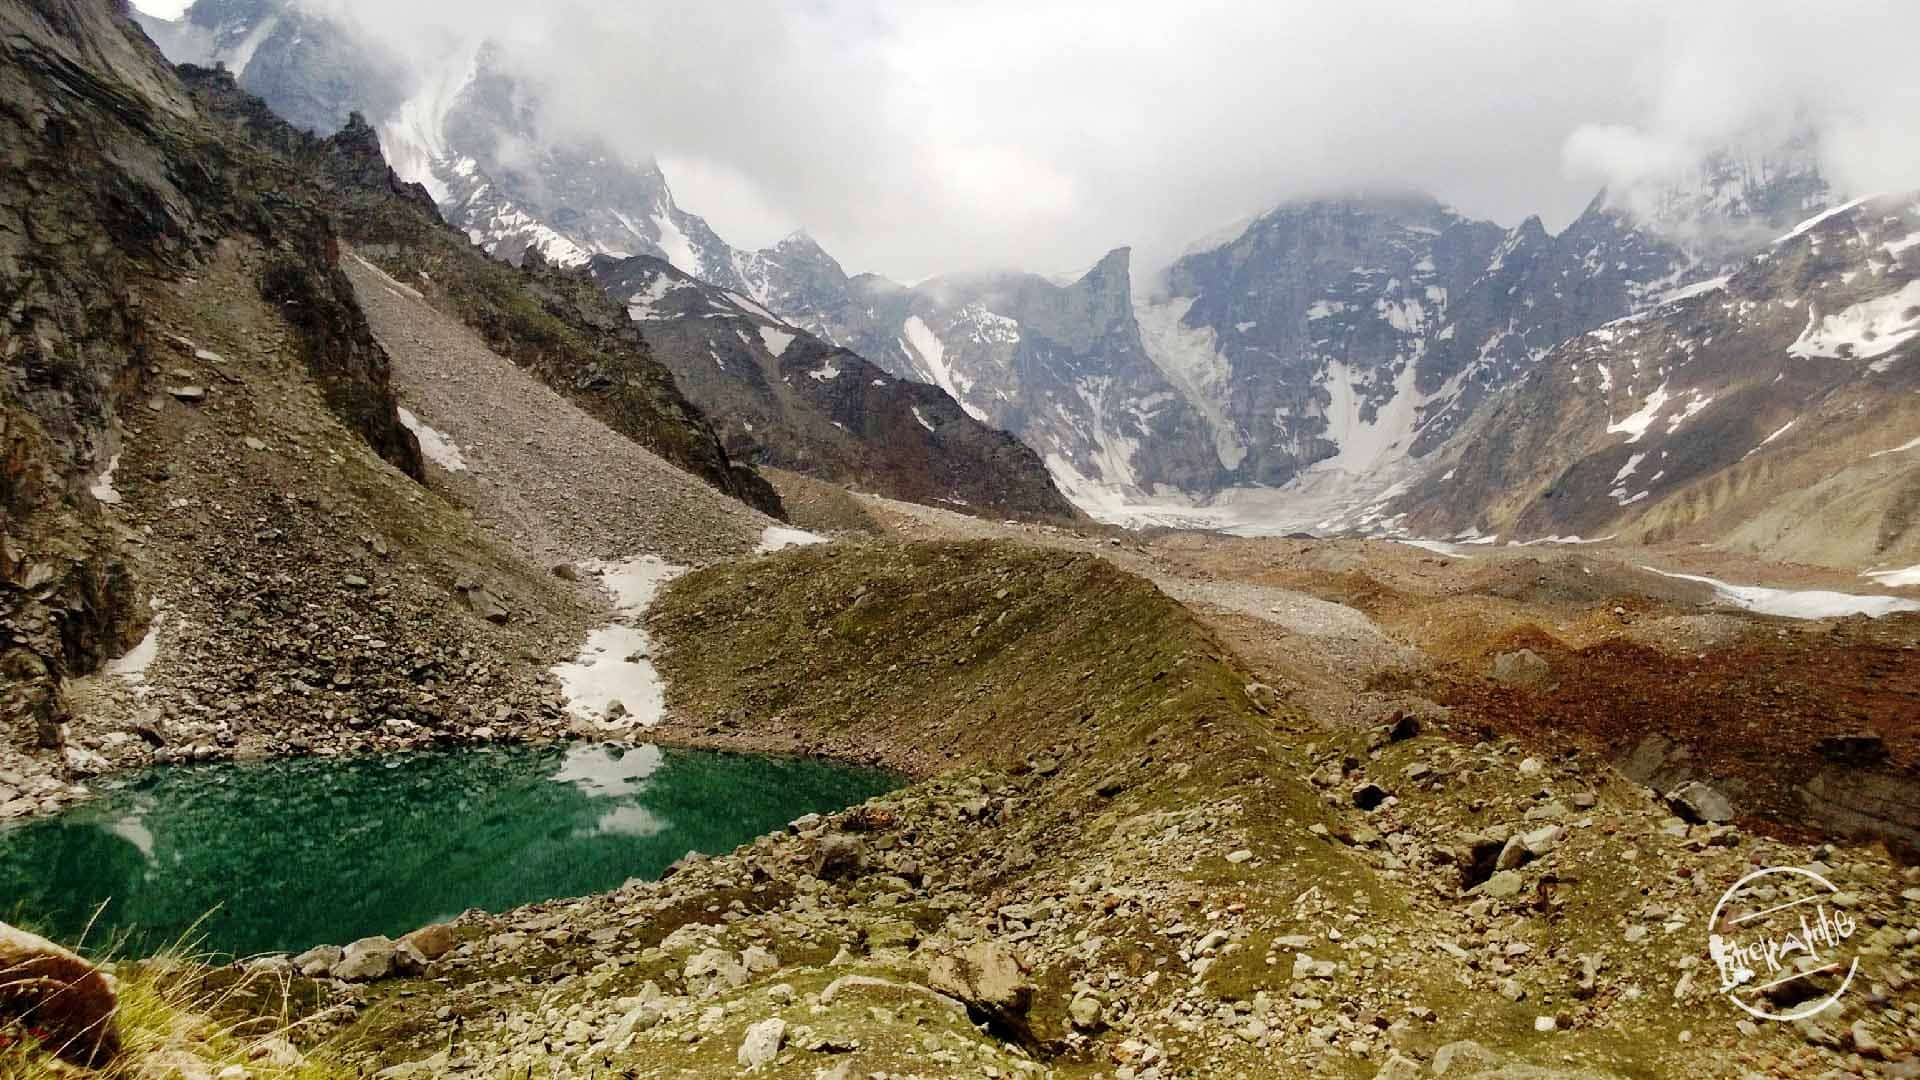 Neelkanth mahadev lake - Unexplored trek in Himachal Pradesh